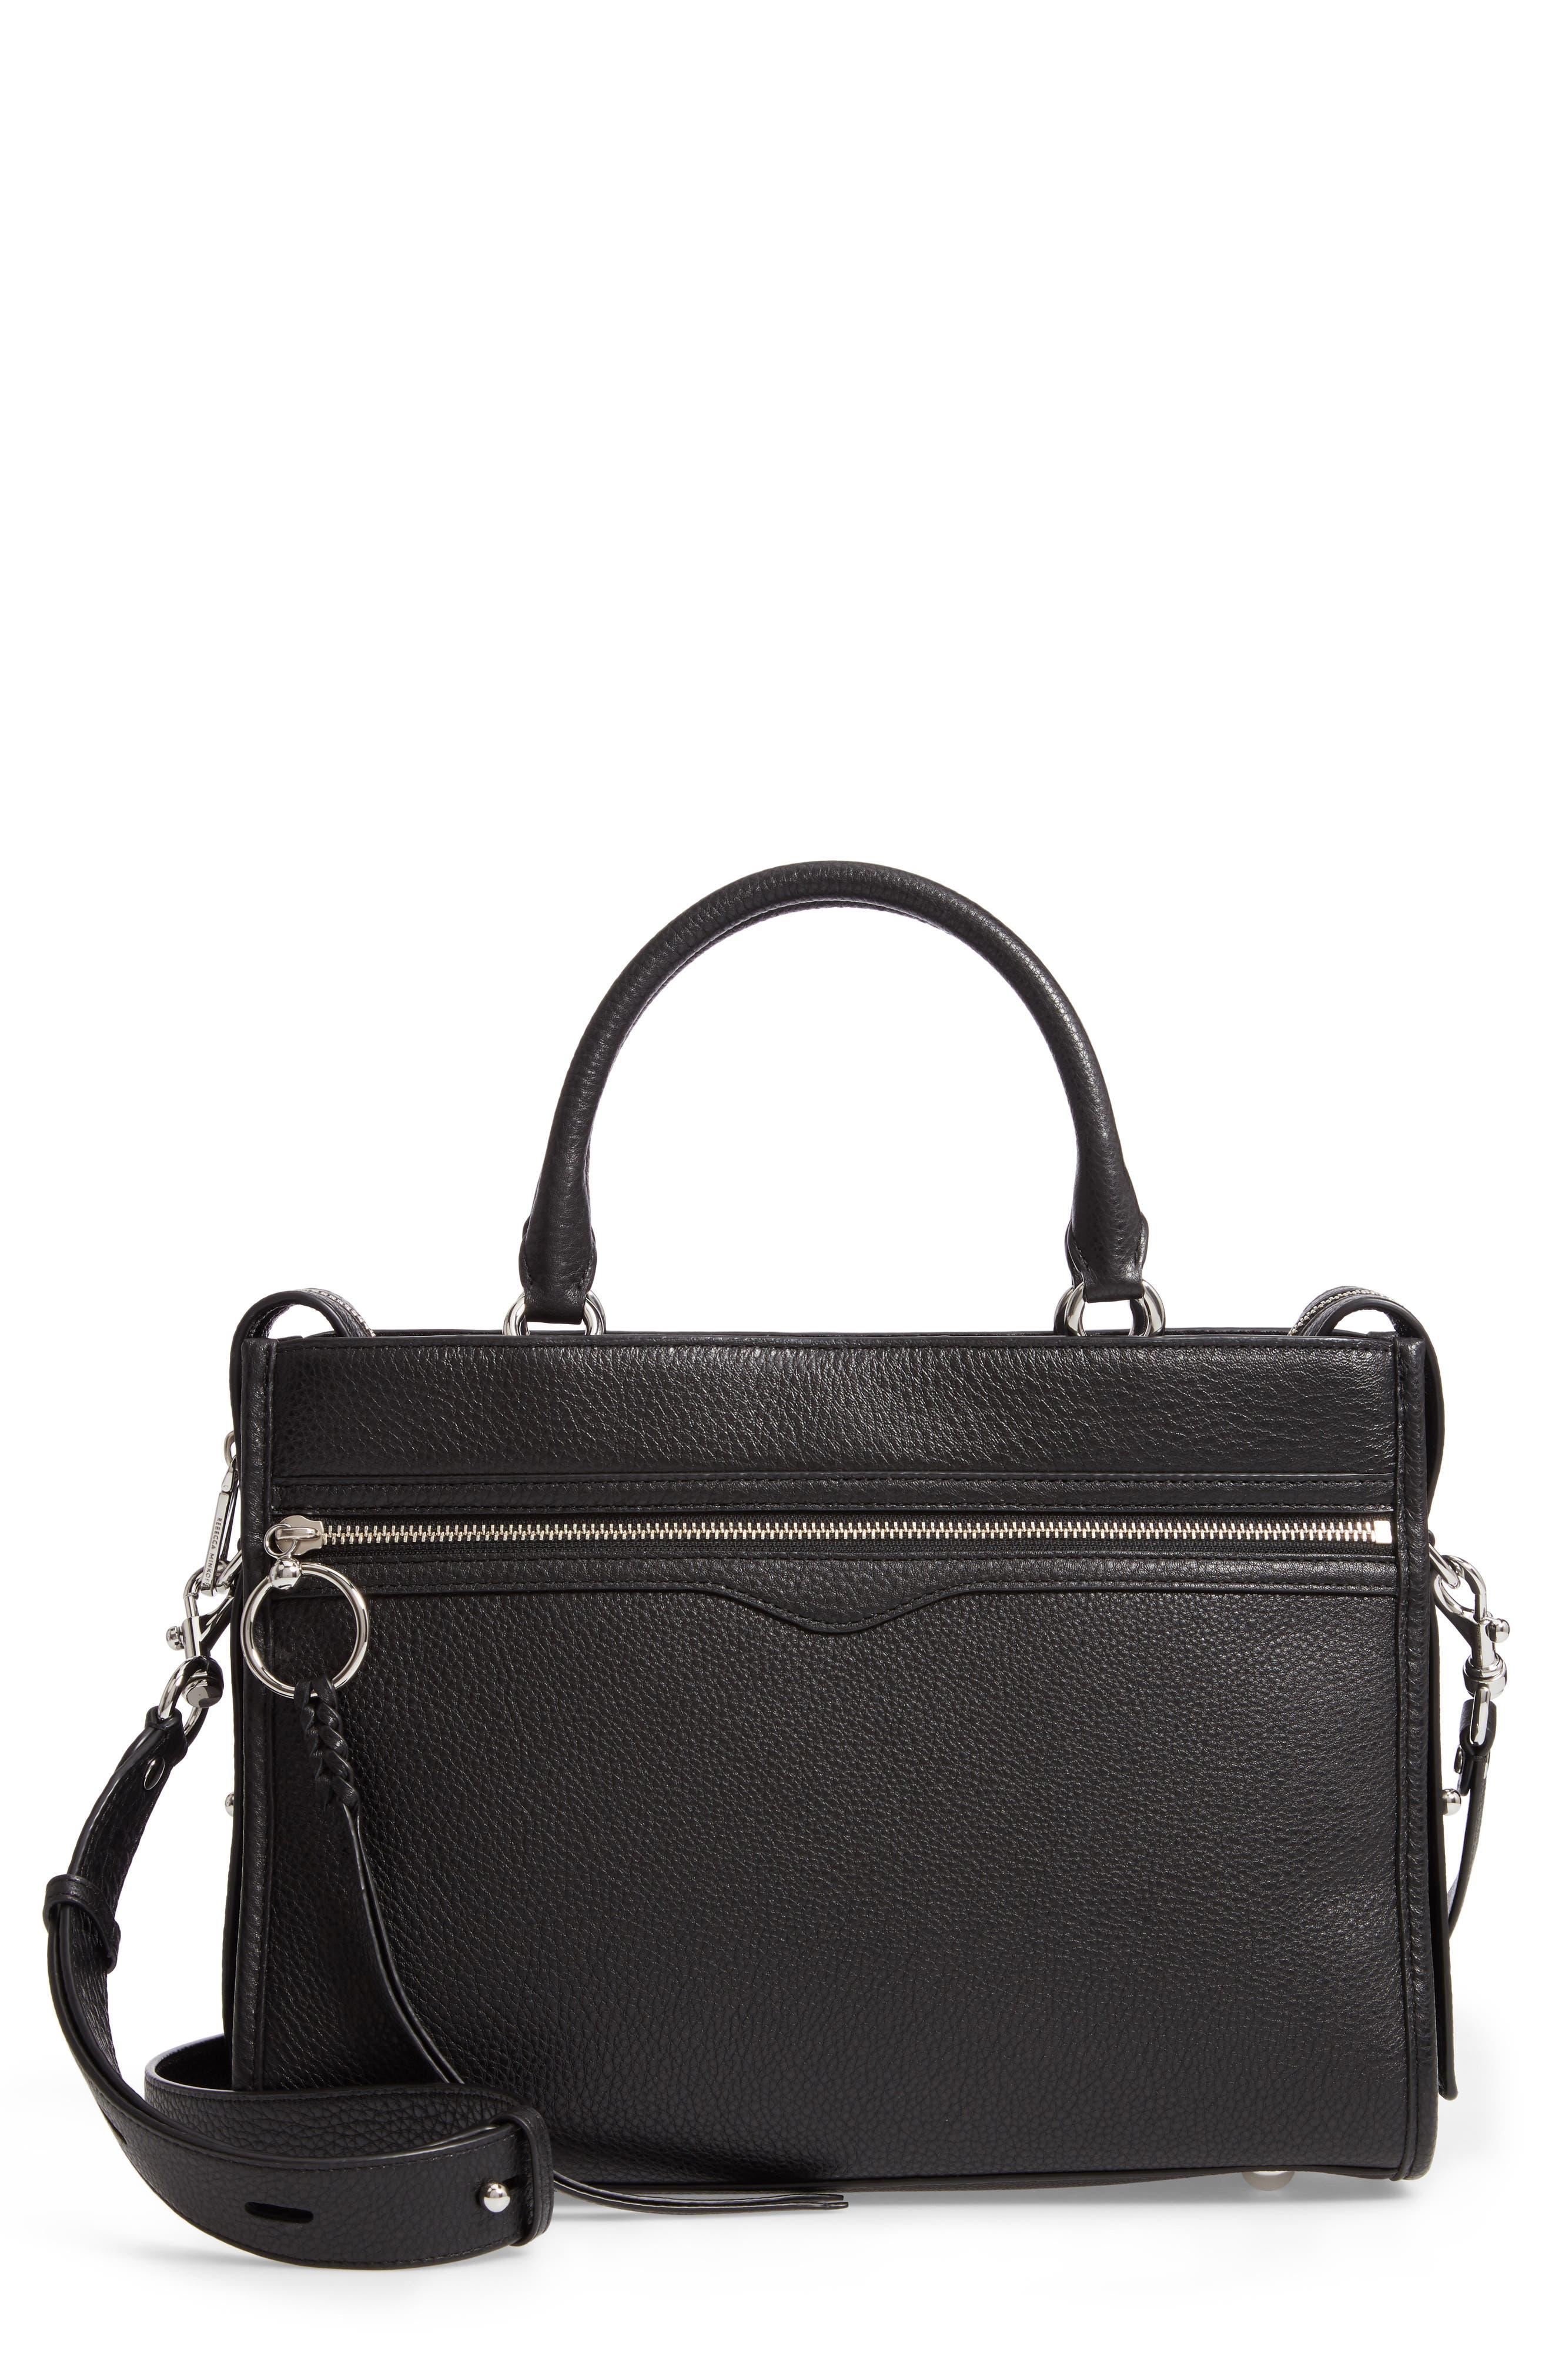 REBECCA MINKOFF, Bedford Zip Leather Satchel, Main thumbnail 1, color, BLACK